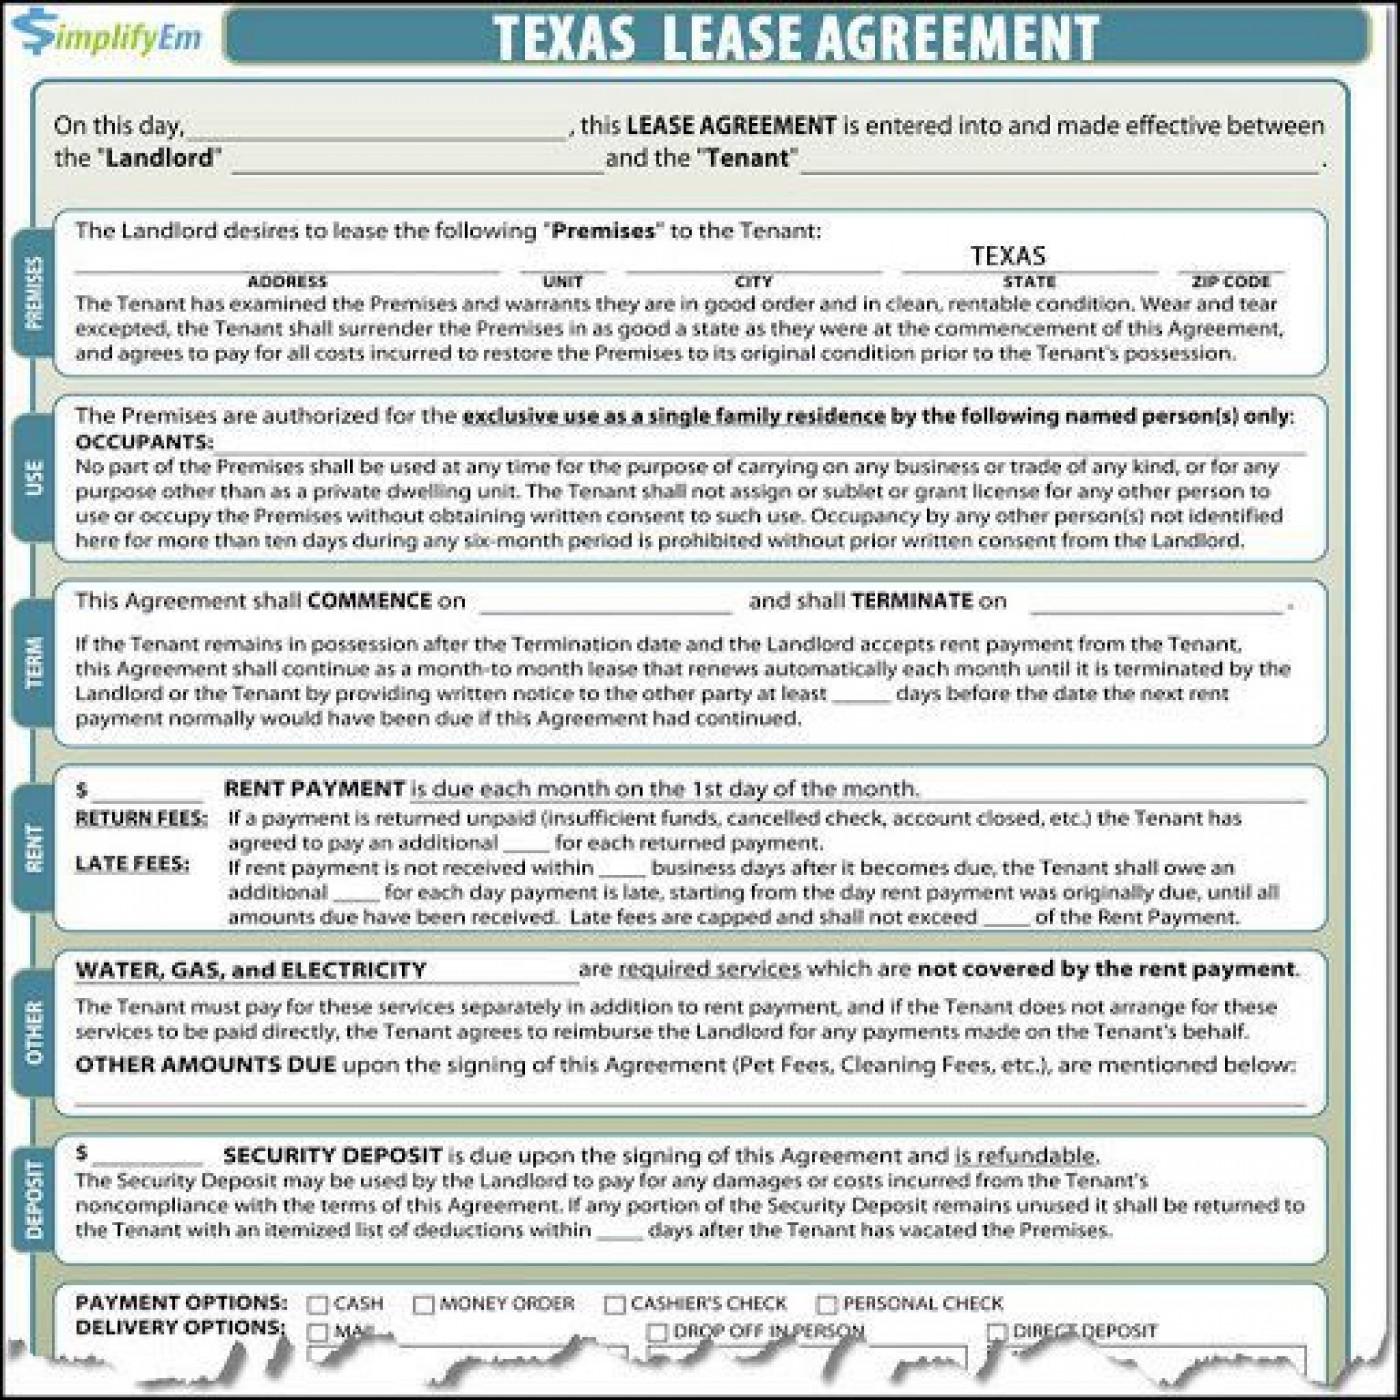 000 Imposing Apartment Lease Agreement Form Texa Photo 1400